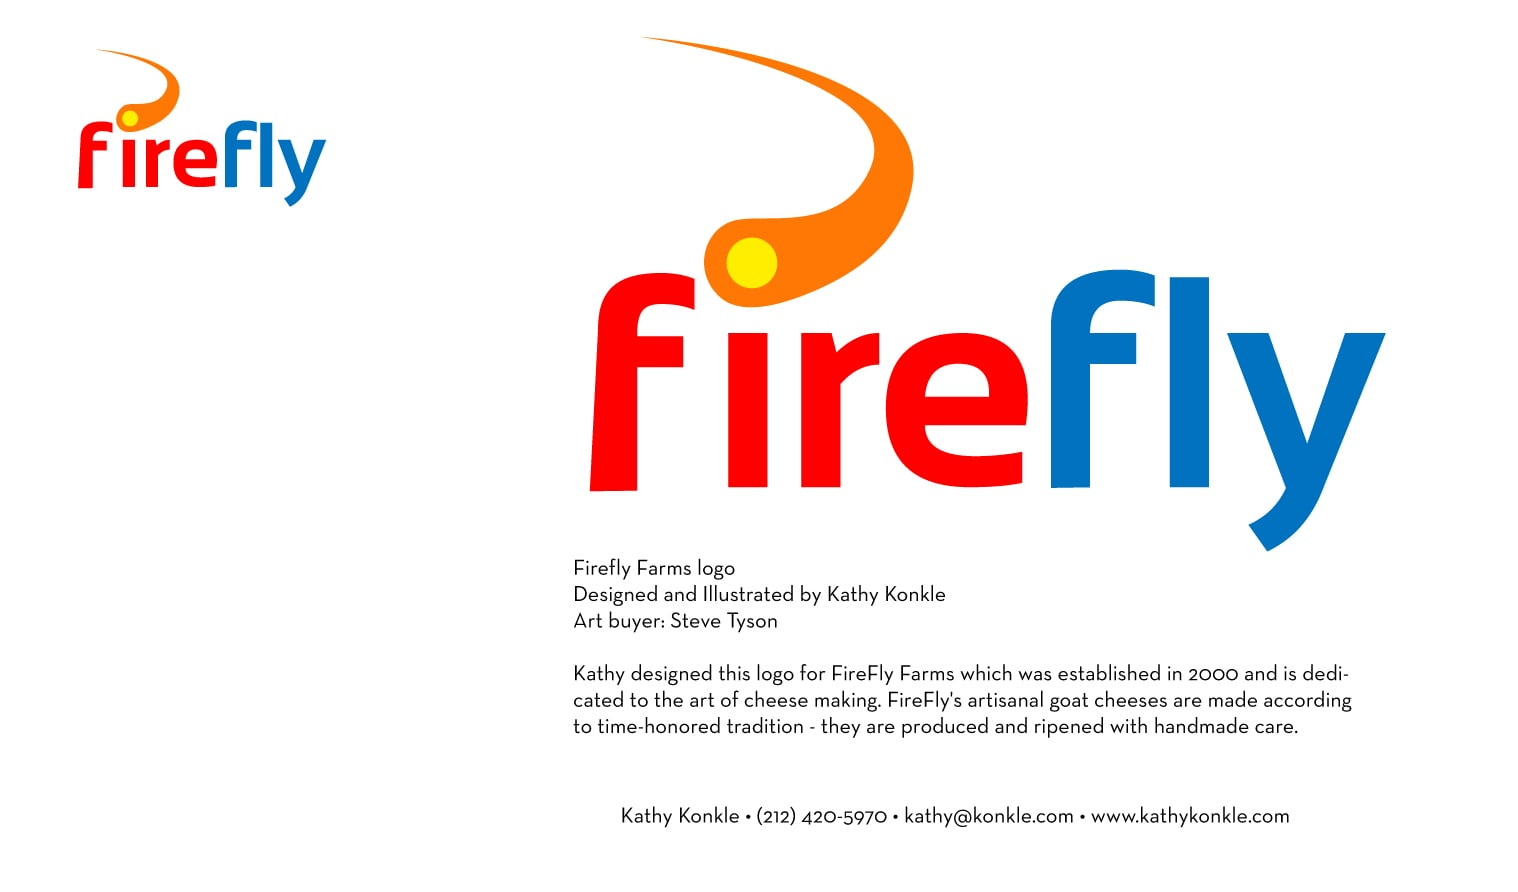 Firefly-logo.jpg